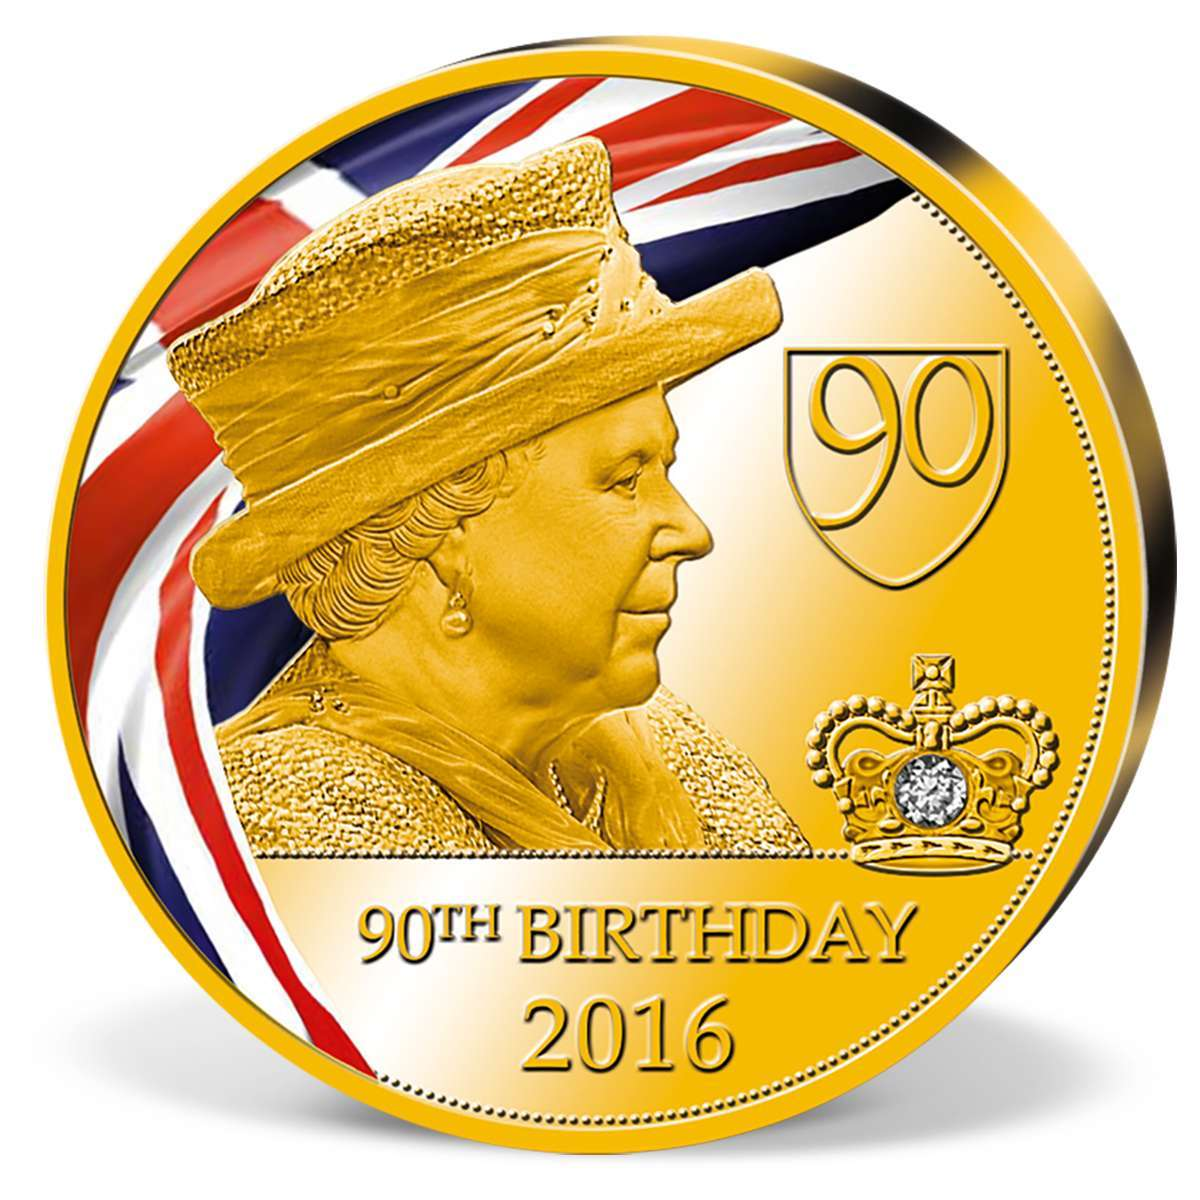 90th birthday commemorative strike - HD1200×1200